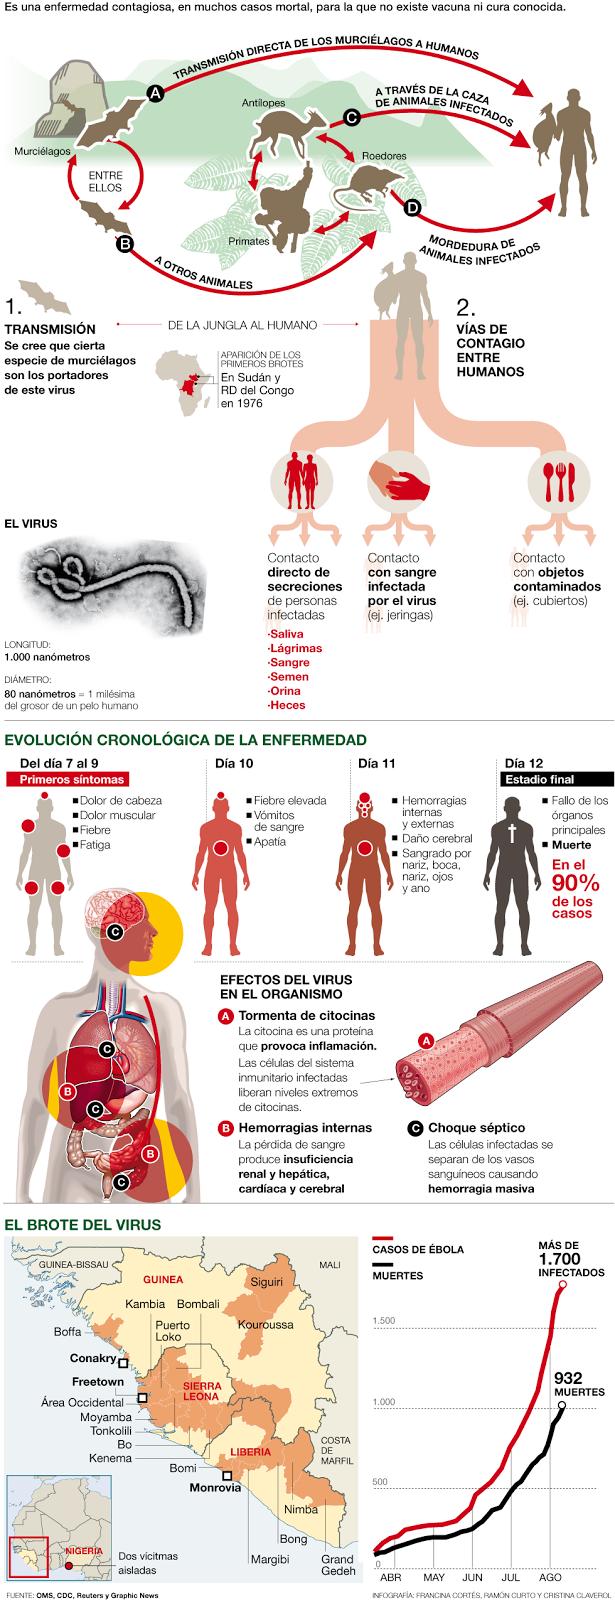 prevencion-virus-ebola